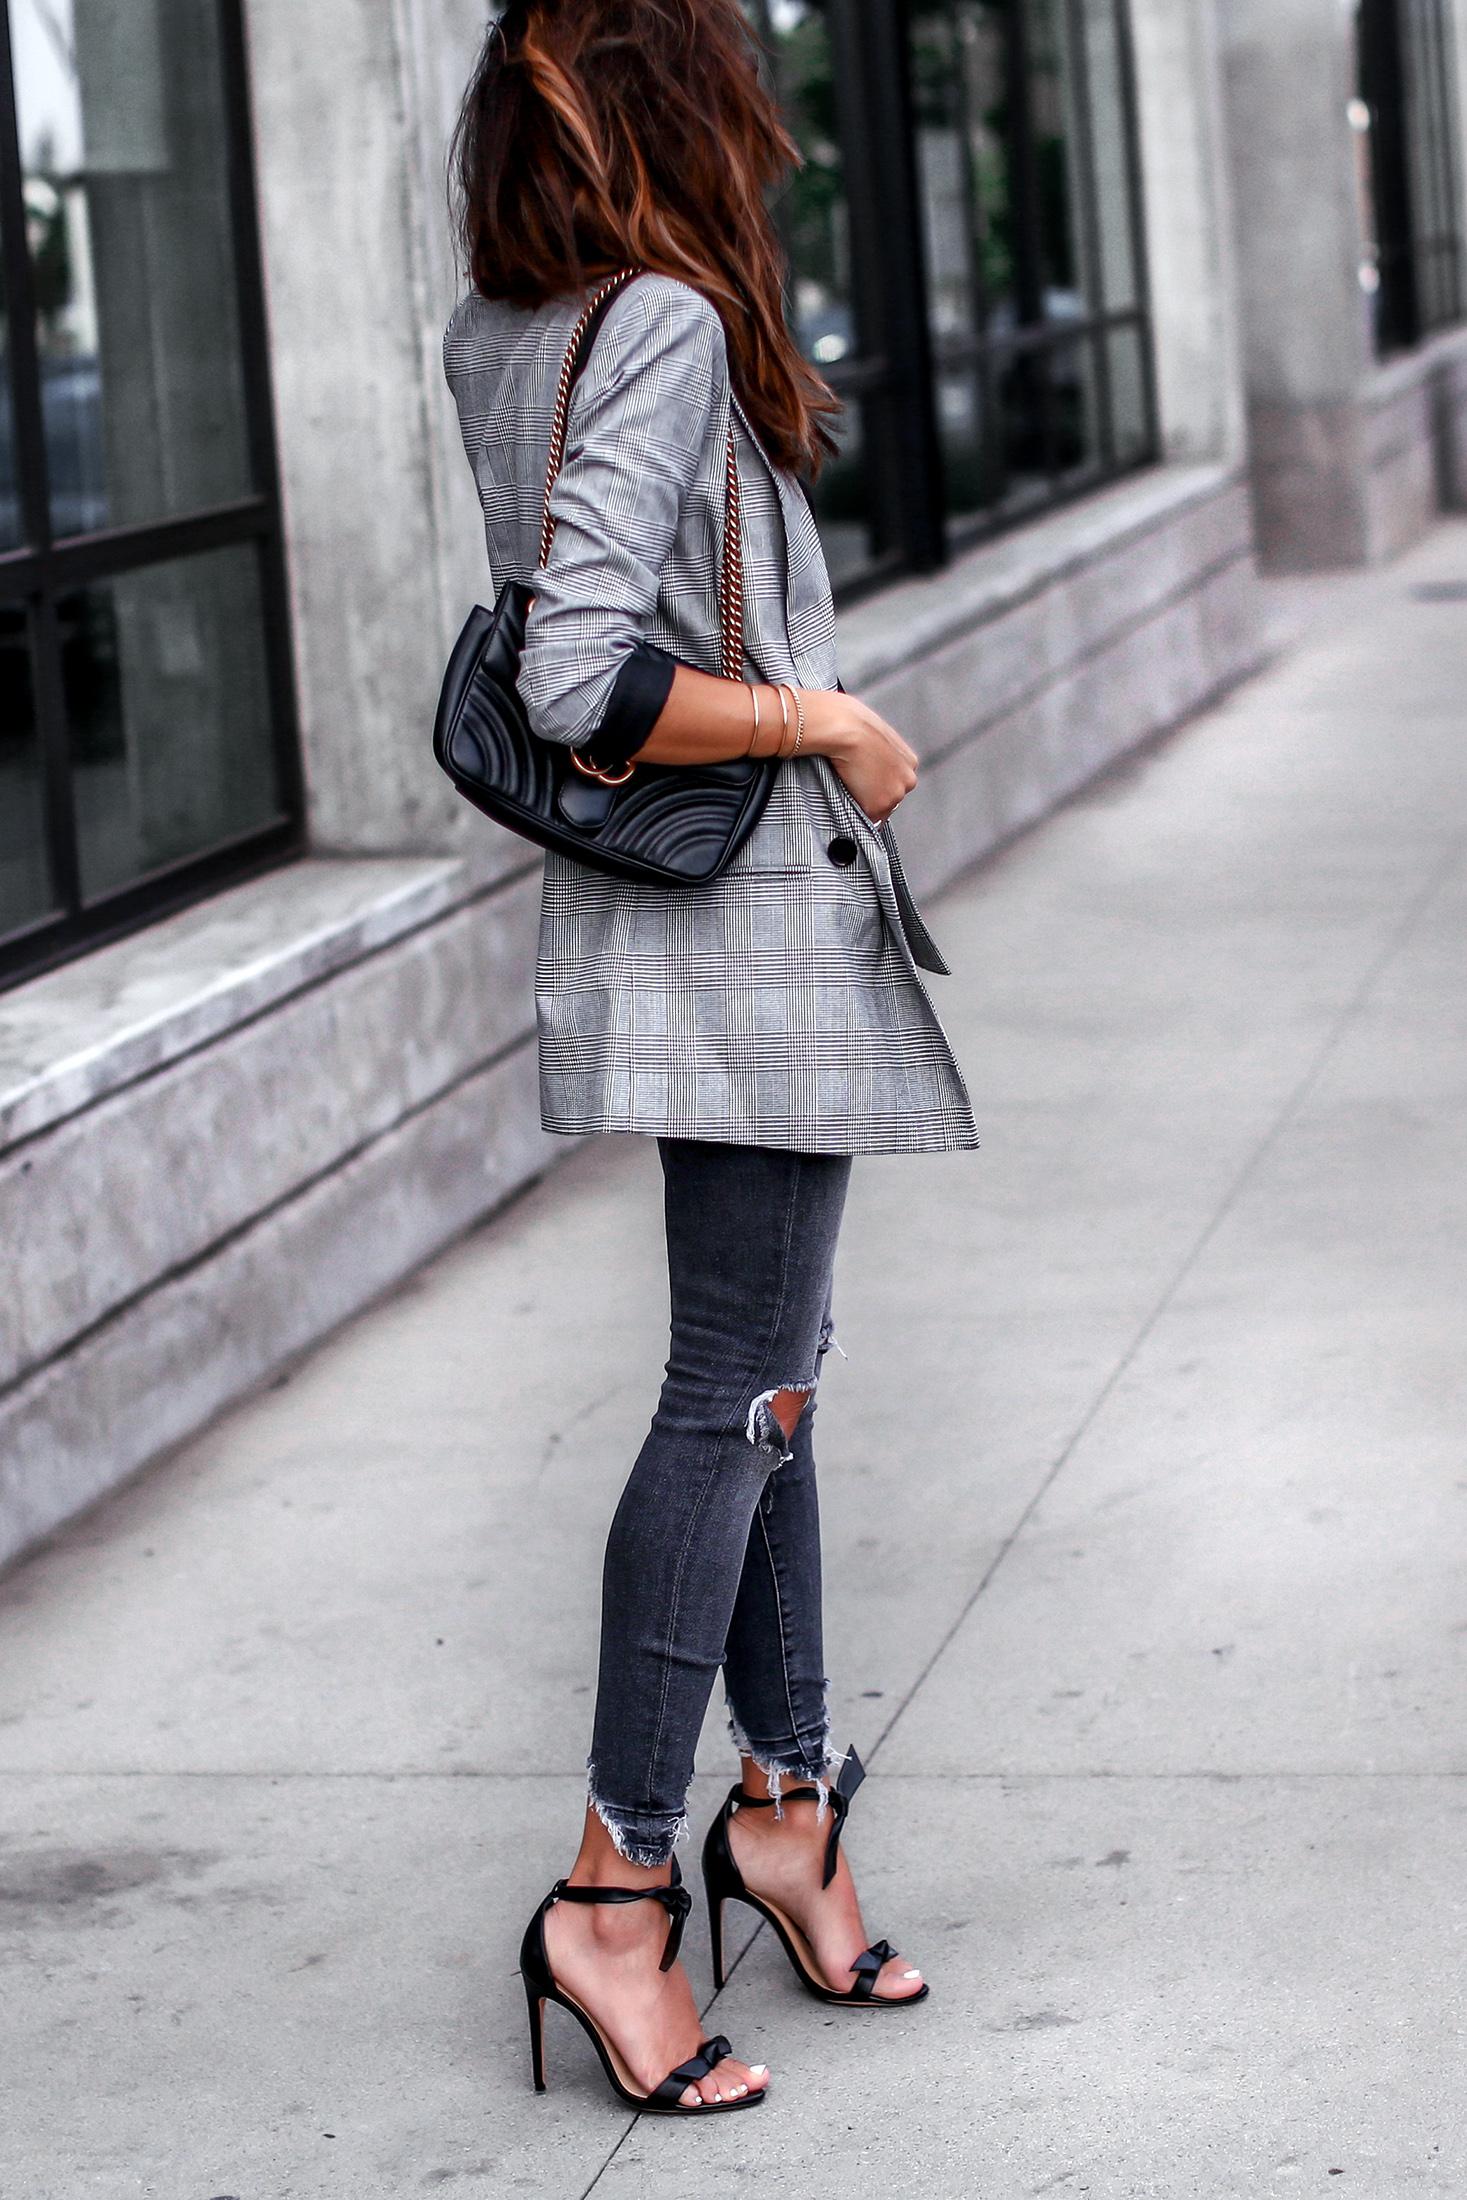 Plaid Blaze Cami NYC Ripped Denim Streetstyle Blogger Lucys Whims Gucci Bag.jpg